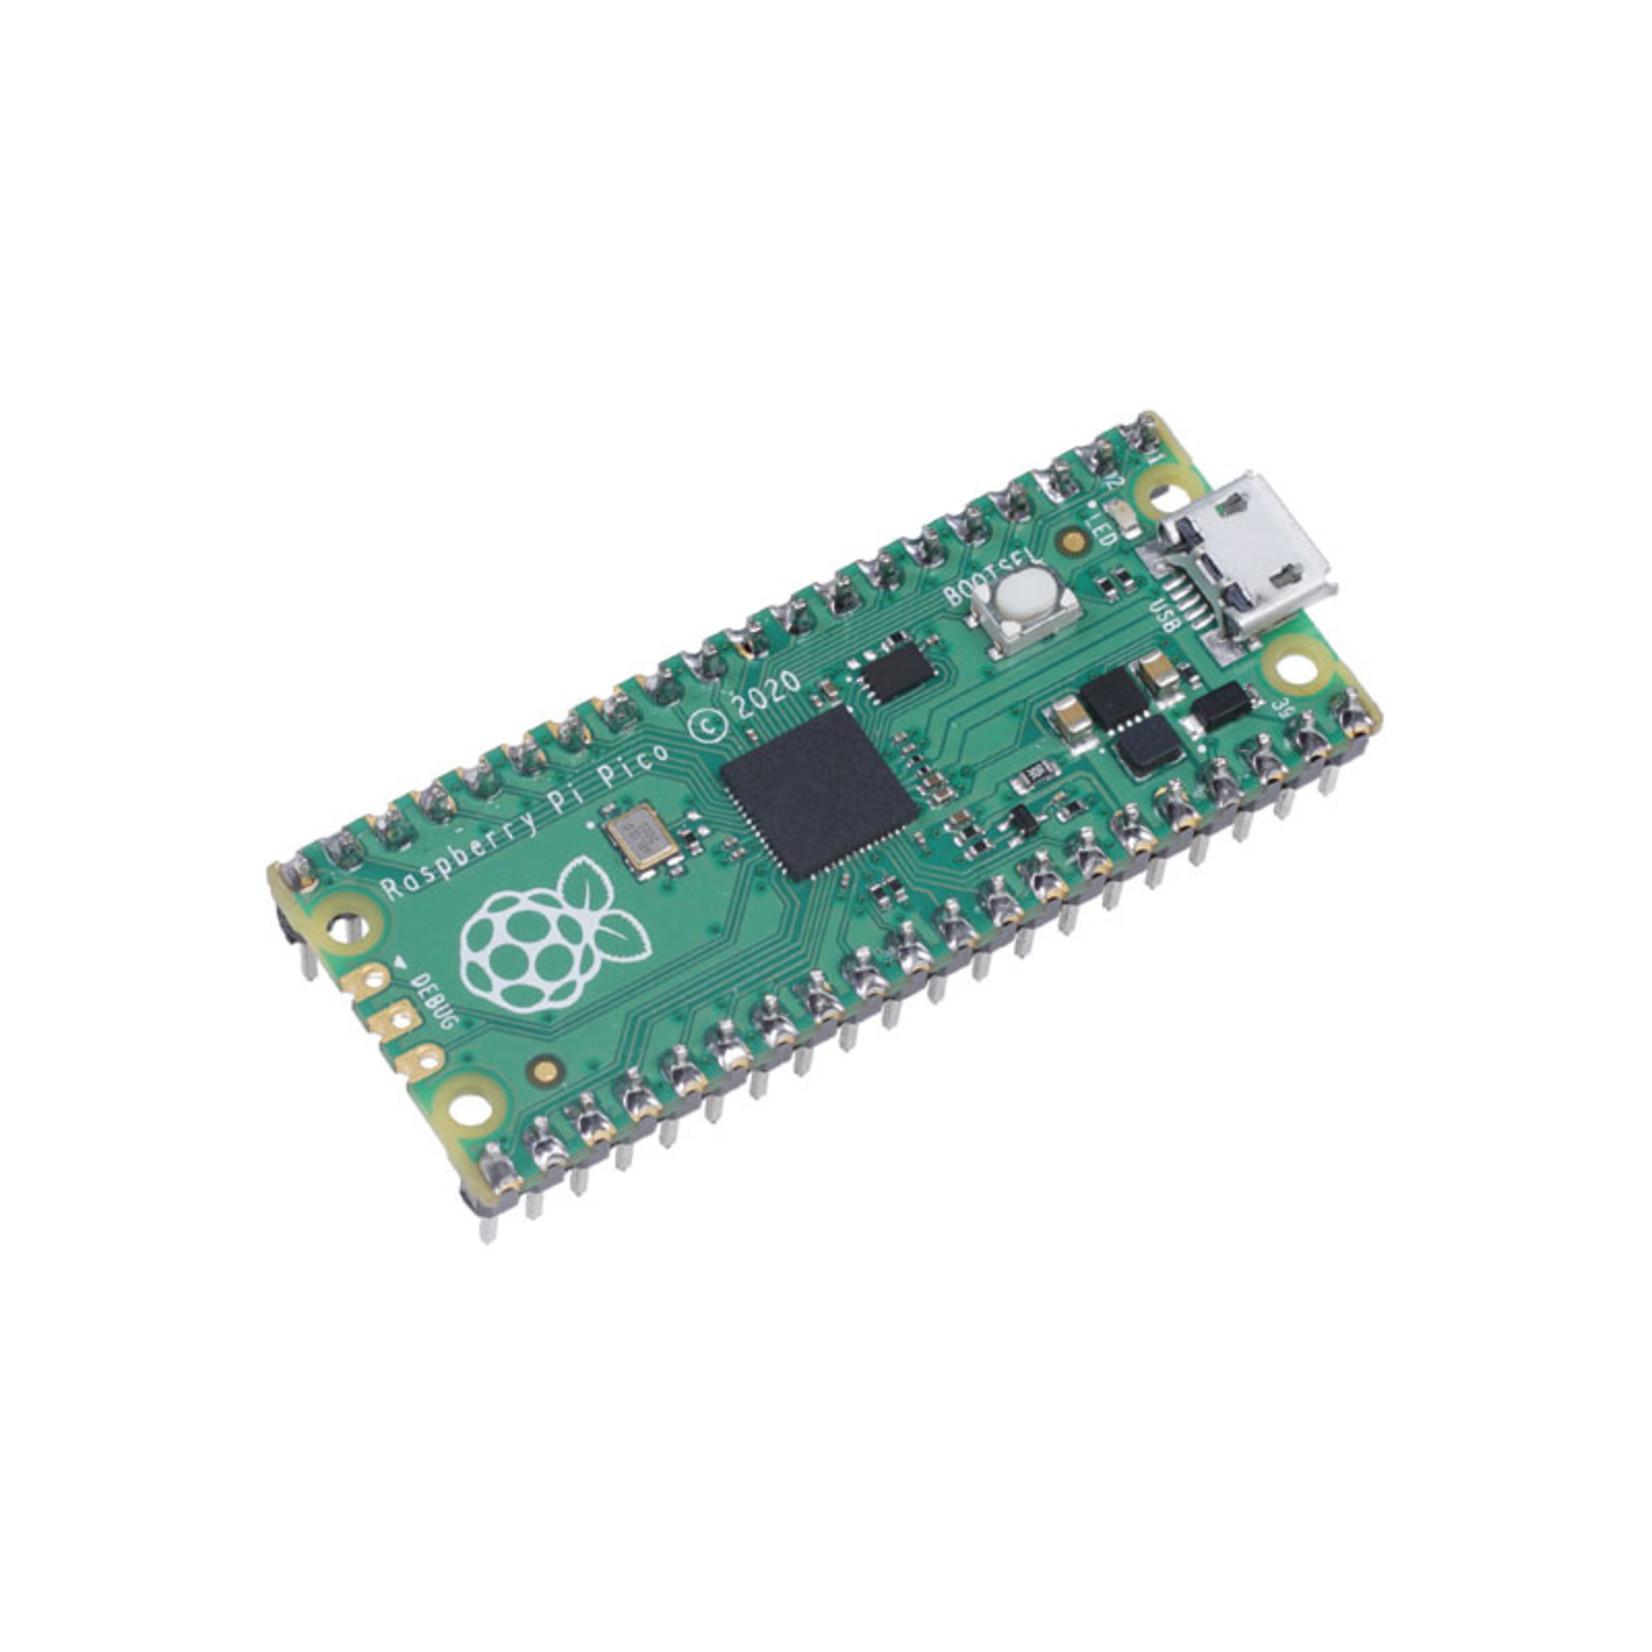 Raspberry Pi Pico + Soldered Headers